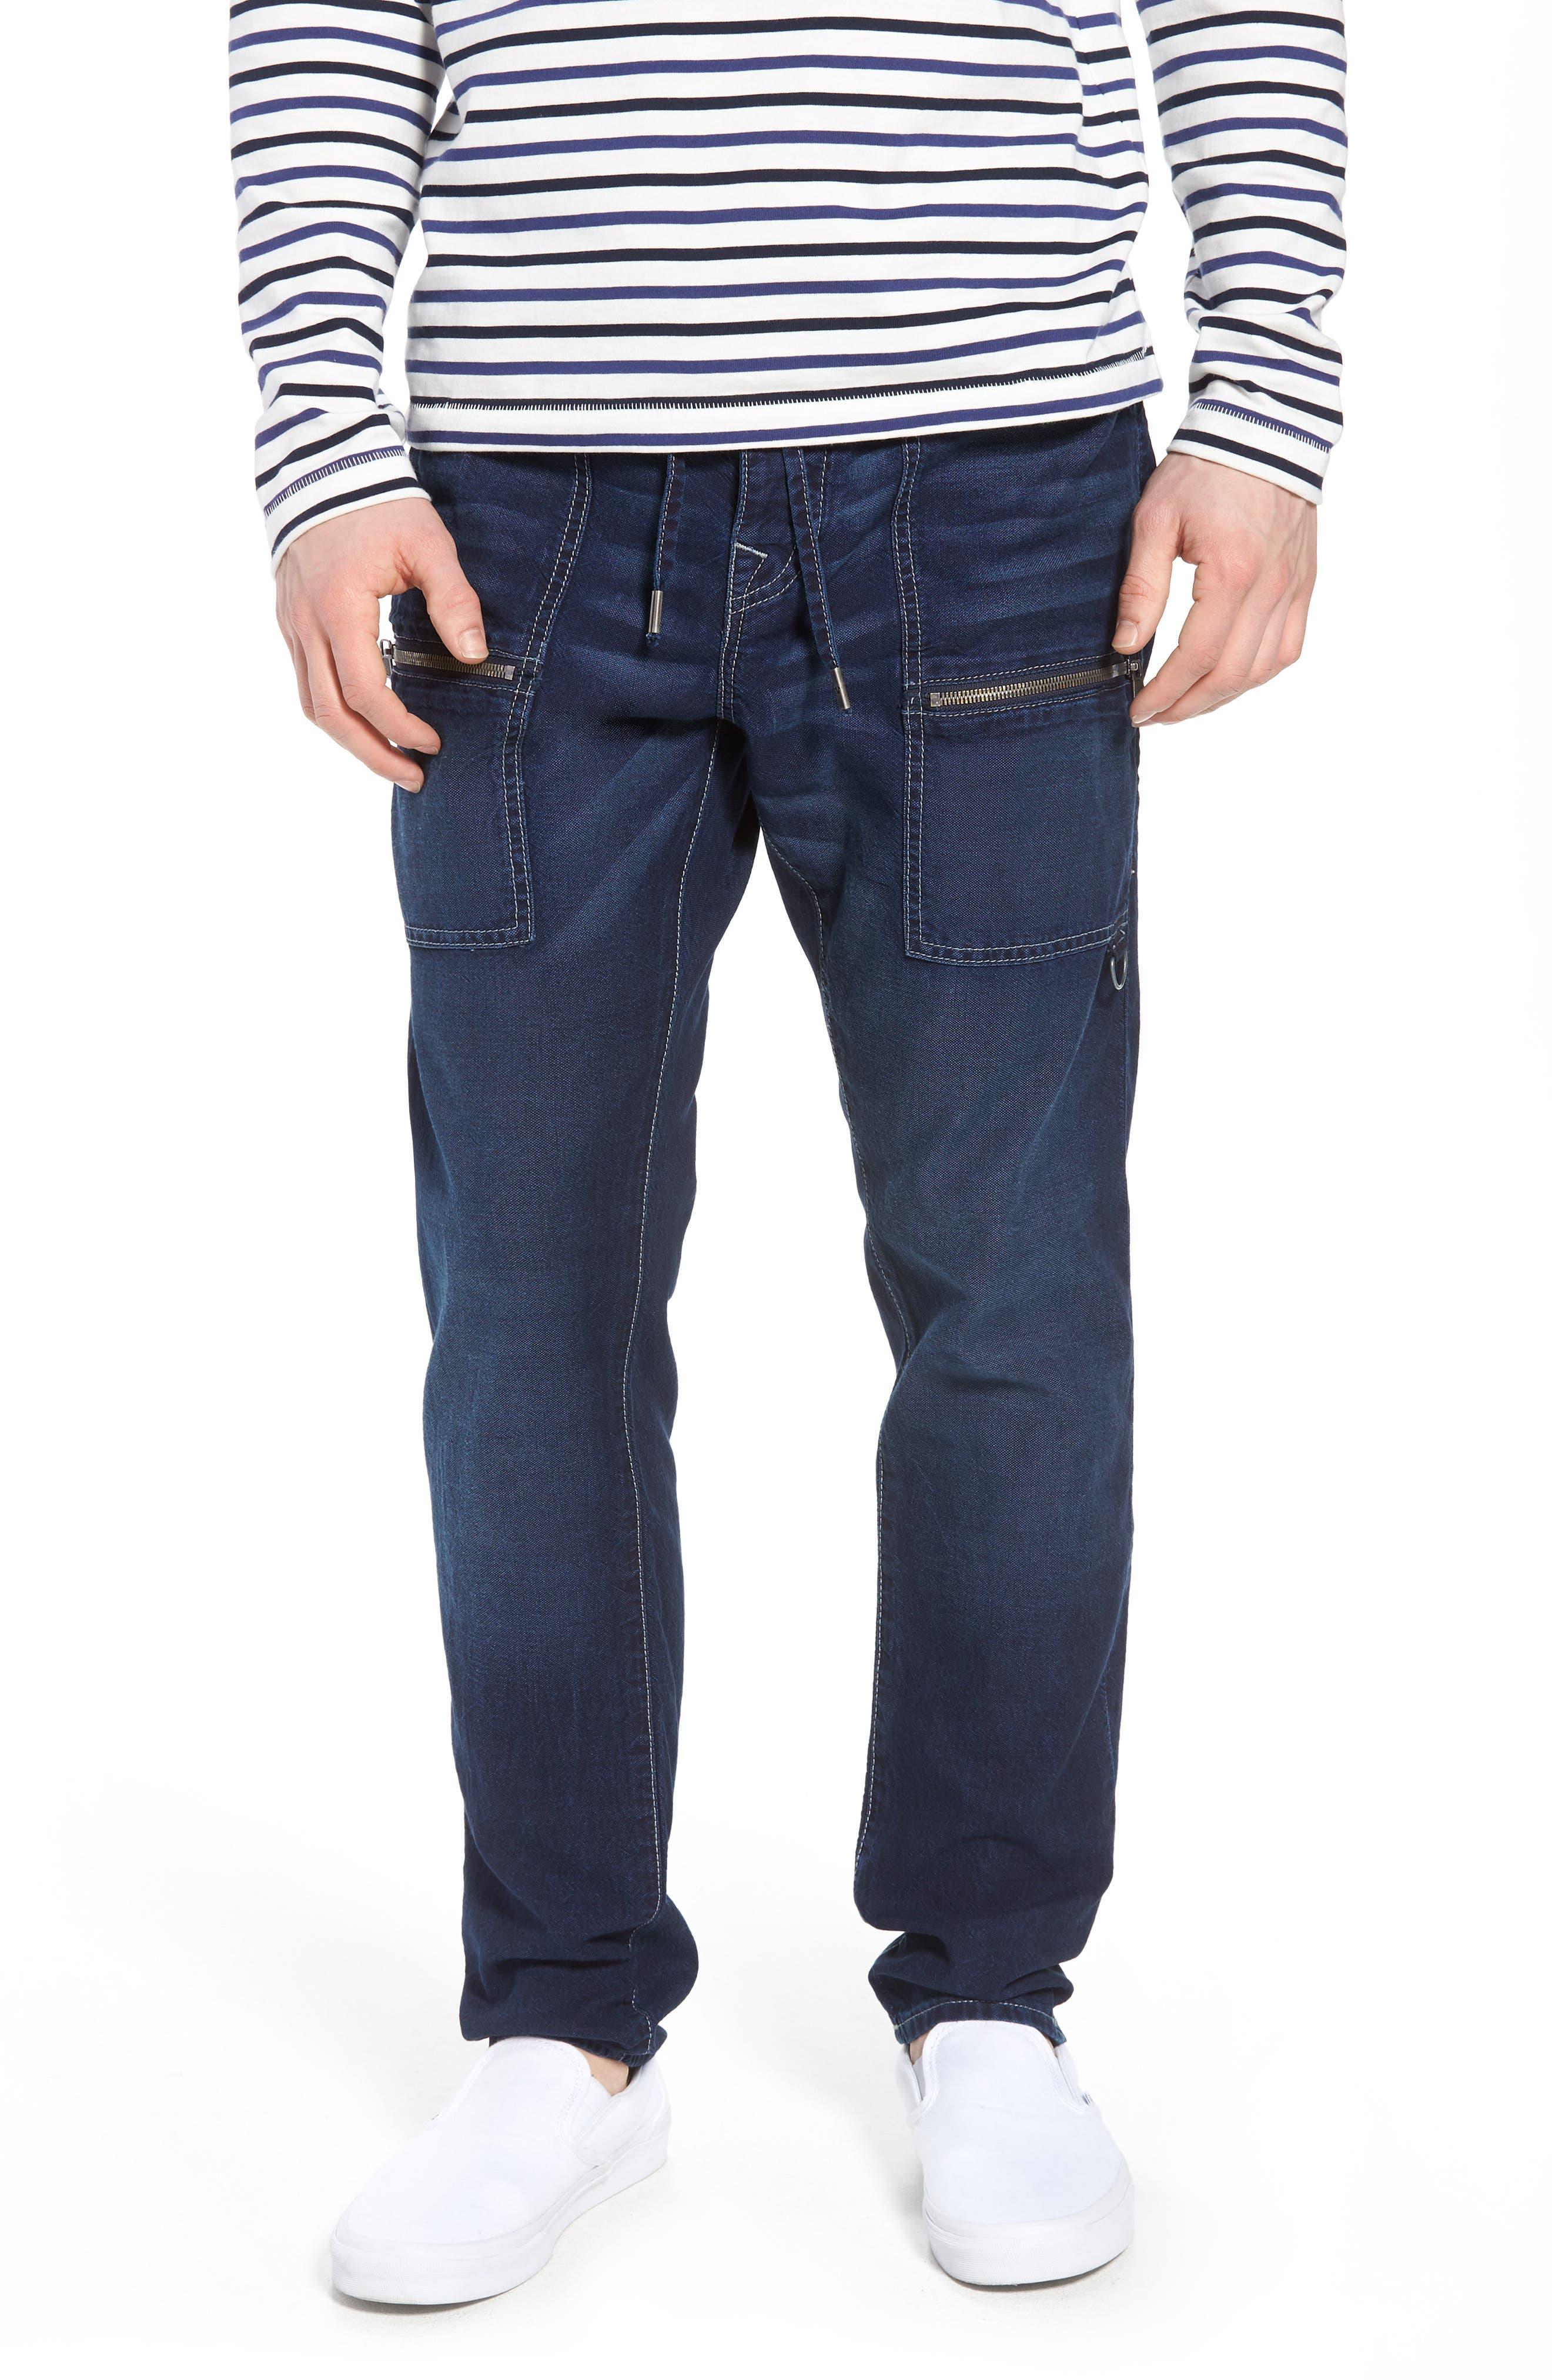 Trail Utility Jeans,                         Main,                         color, UNION SPECIAL